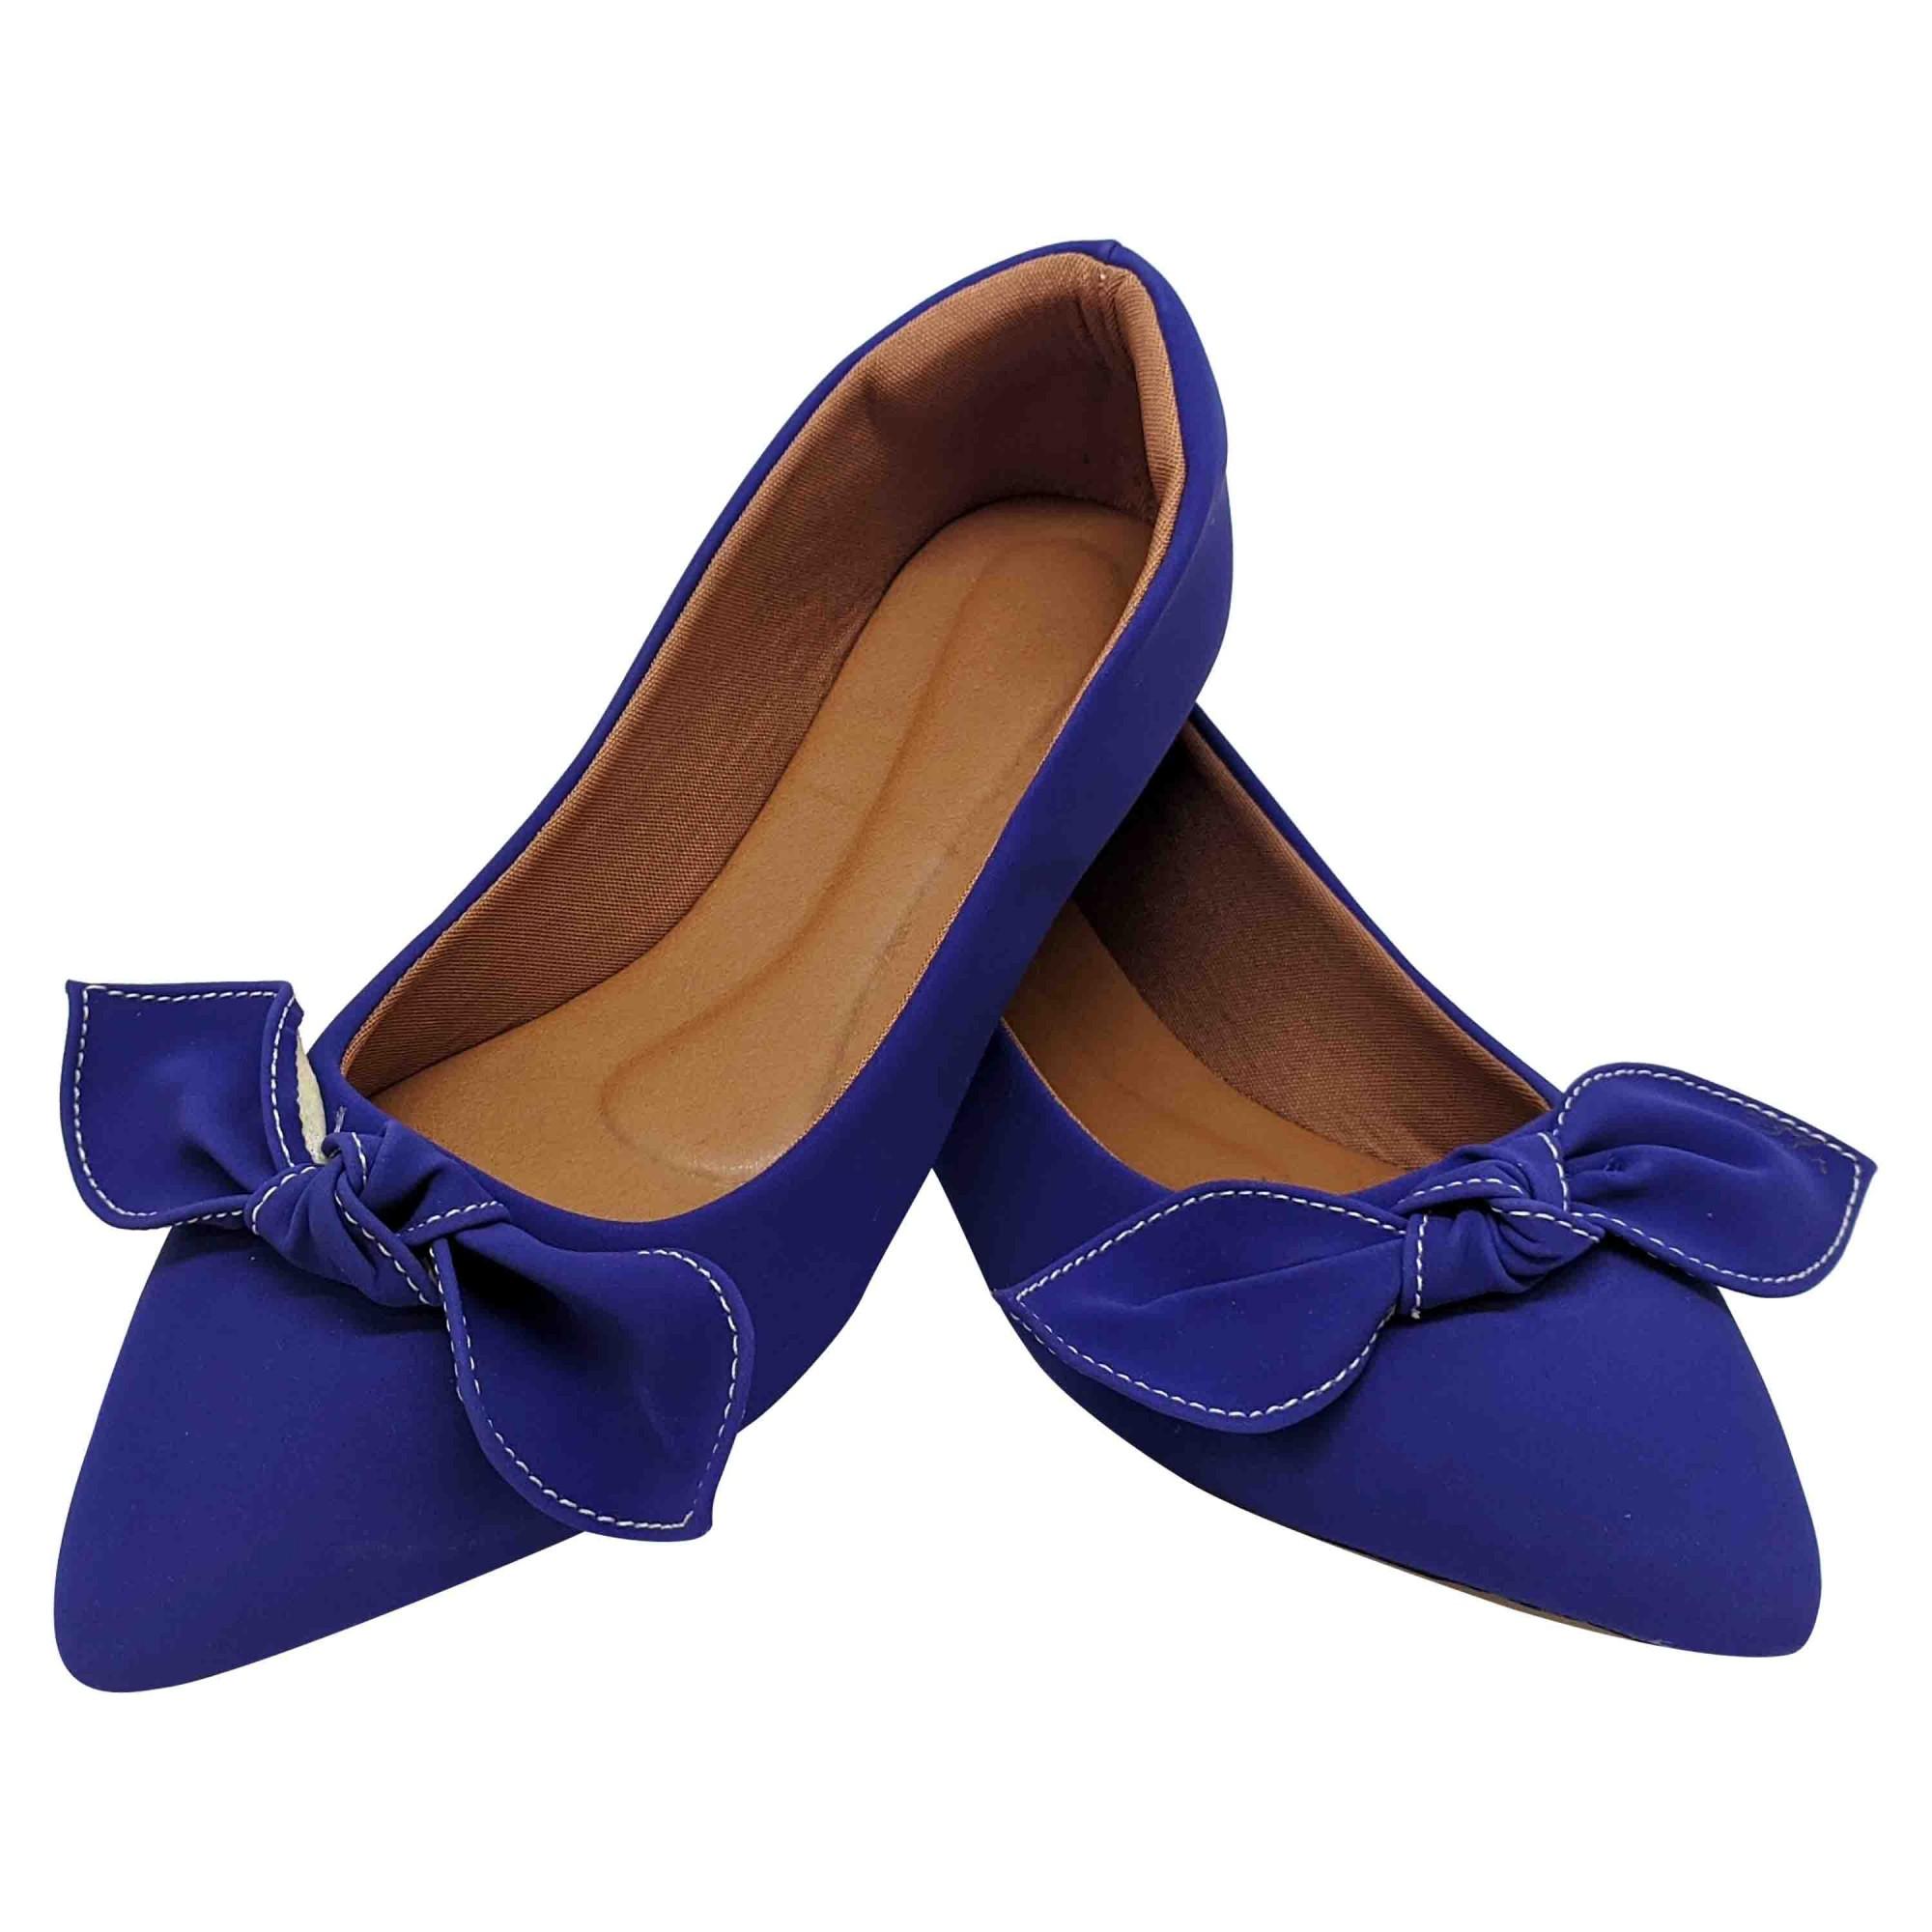 Sapatilha Confort Heloká Bico Fino Nobuck Azul